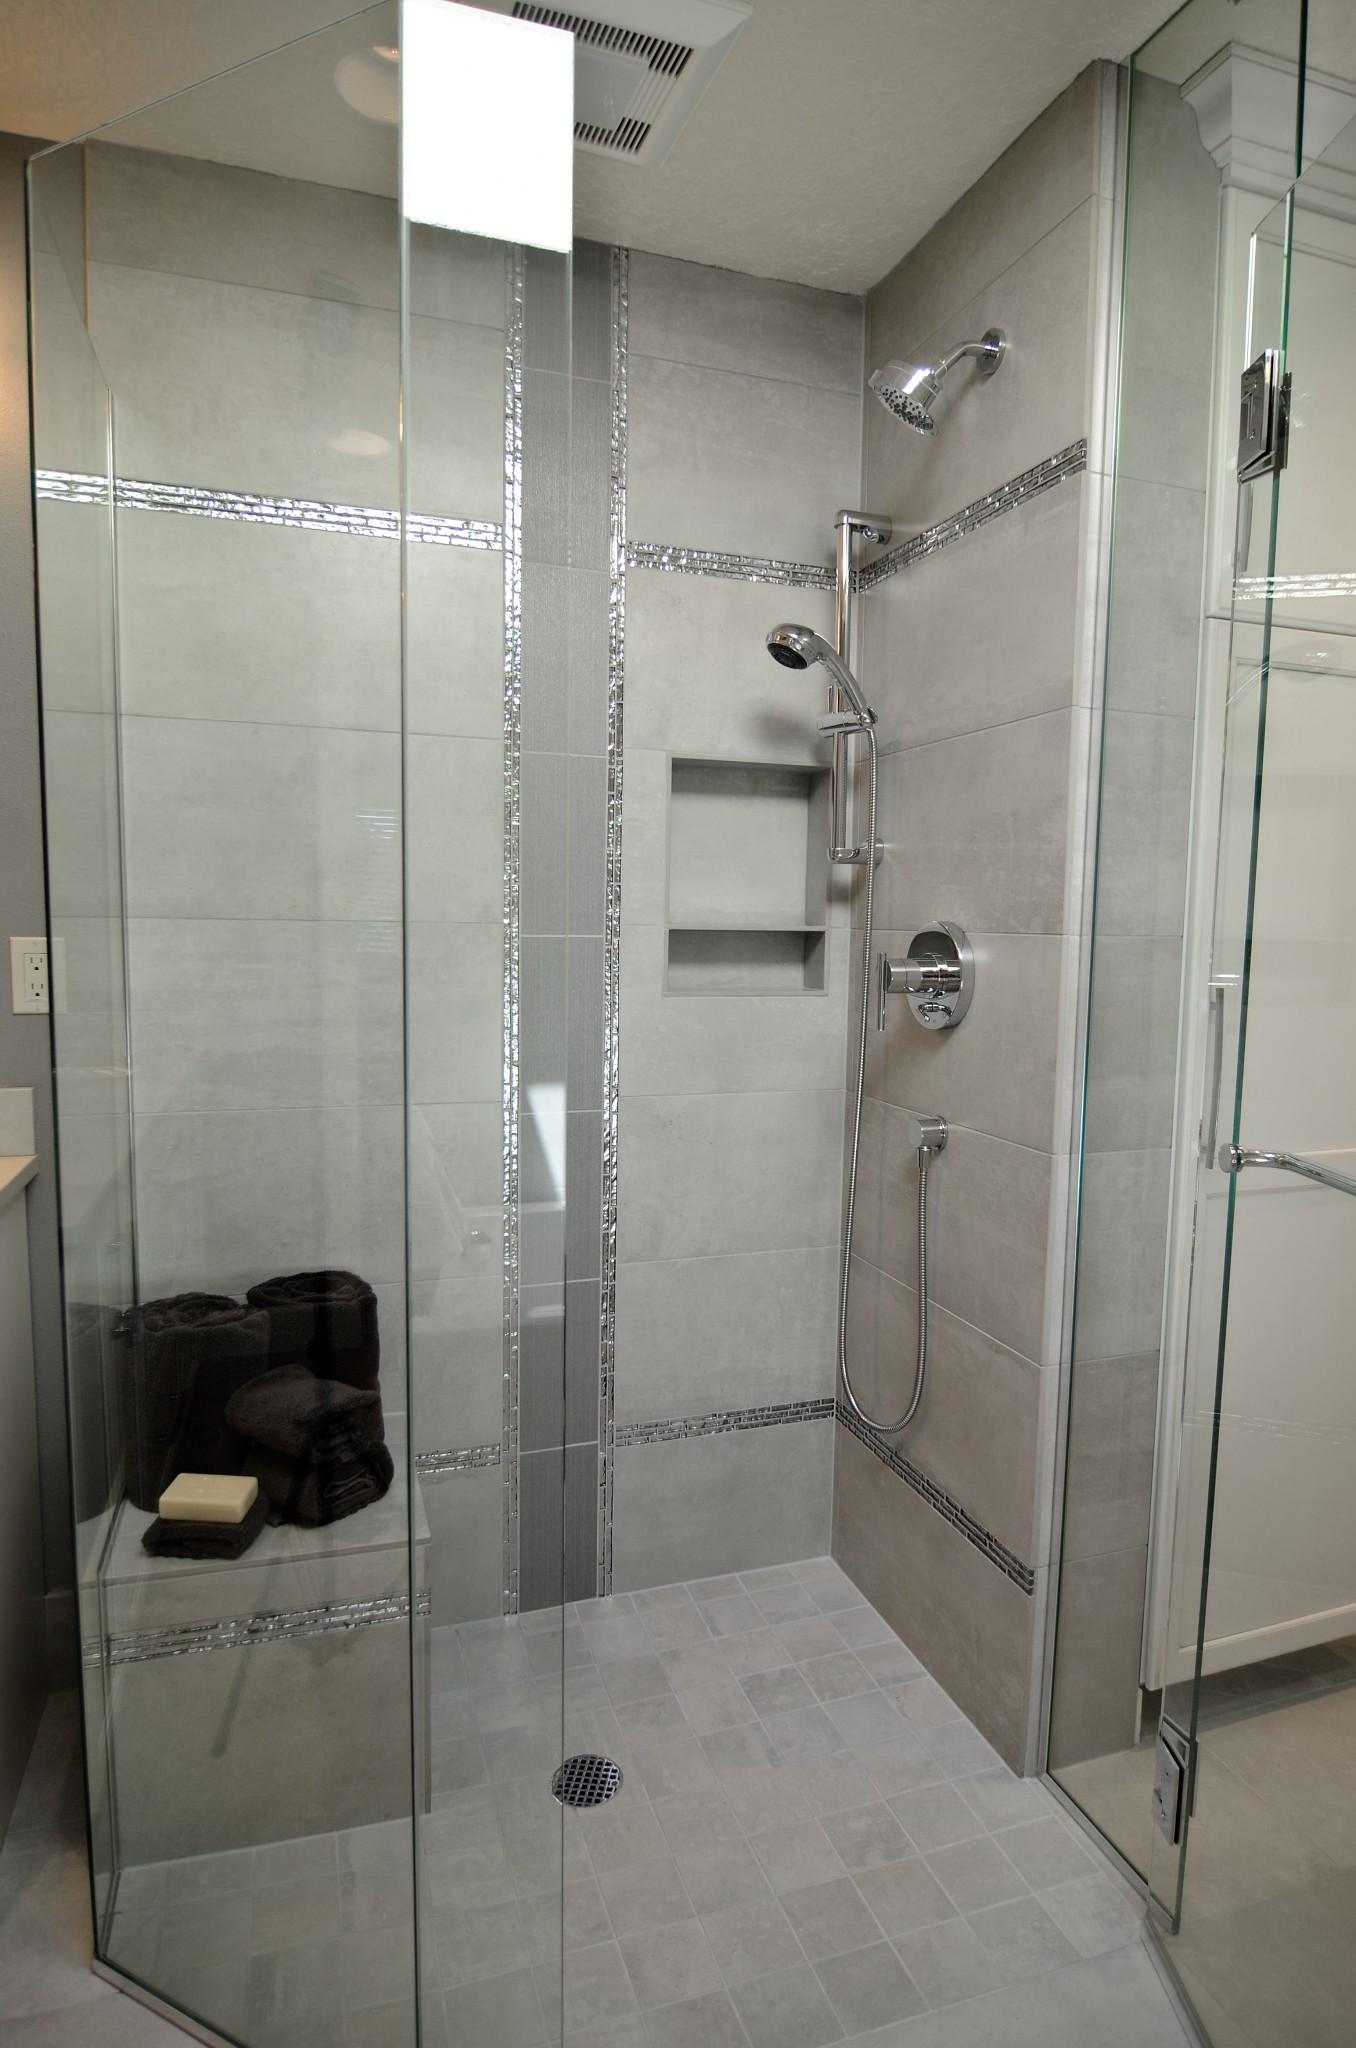 reinventedranch06-bathroom-shower-vertical